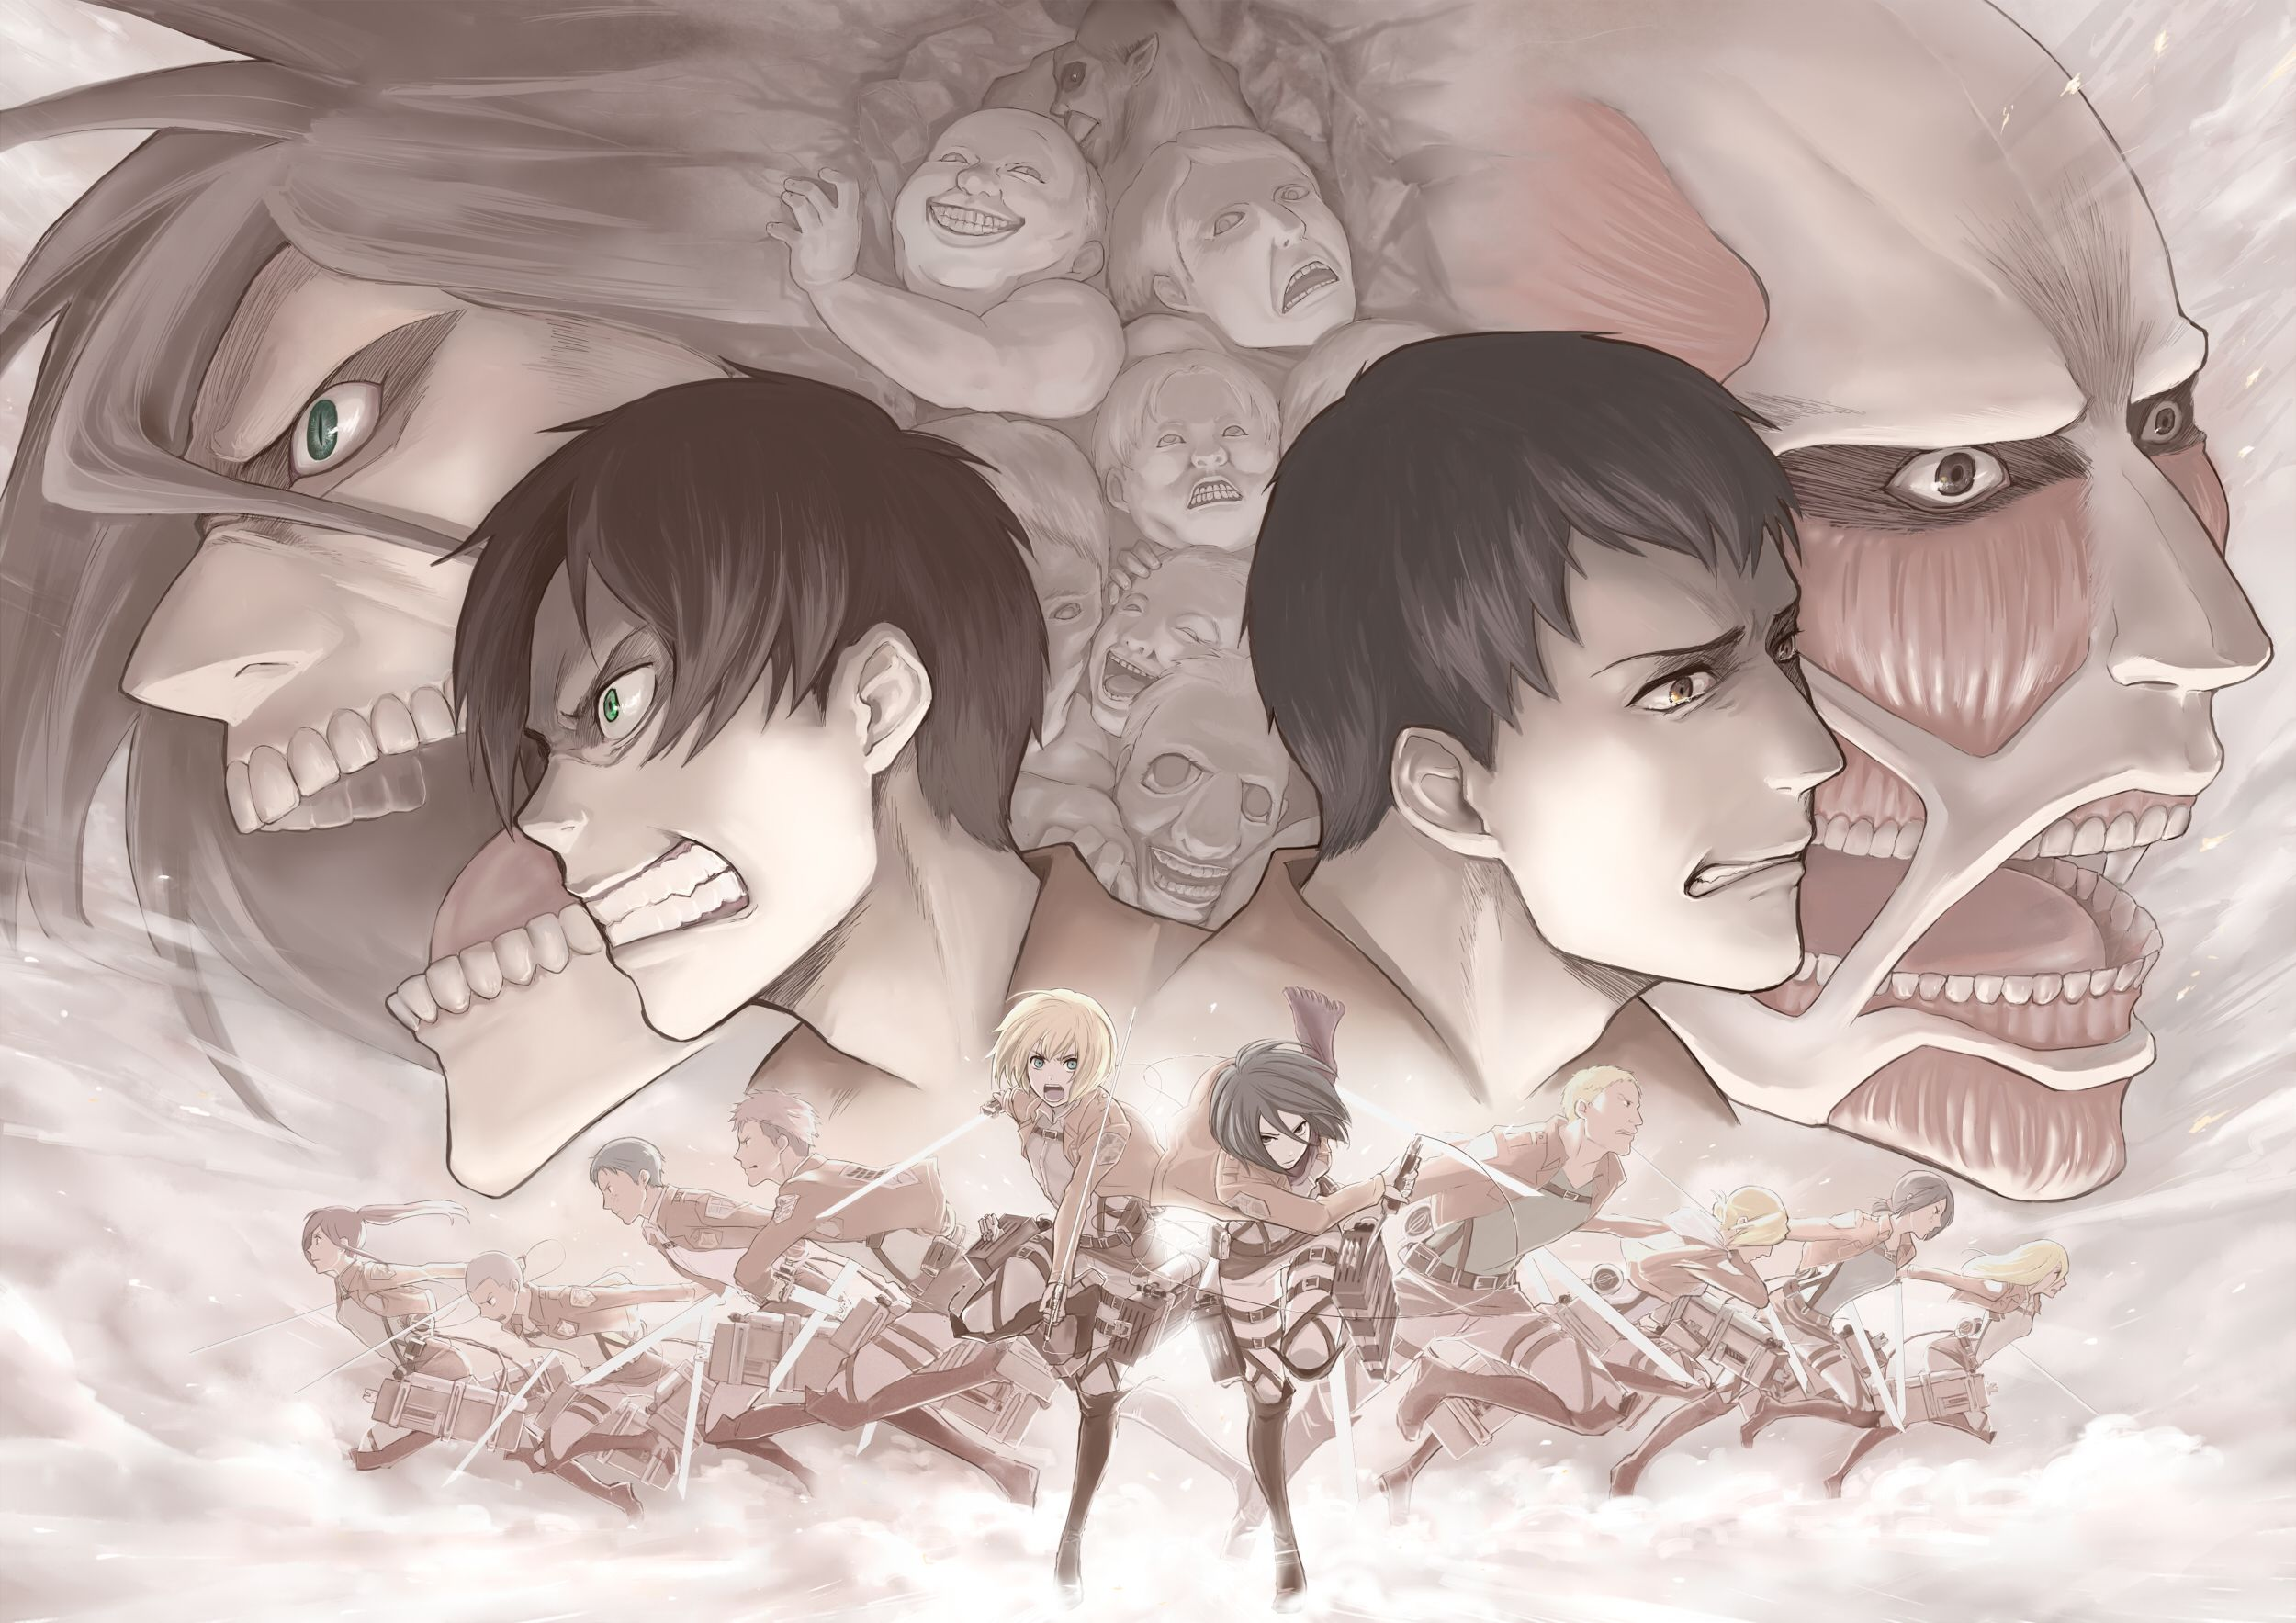 Anime Attack On Titan Attack On Titans Wallpaper Attack On Titan Anime Attack On Titan Levi Attack On Titan